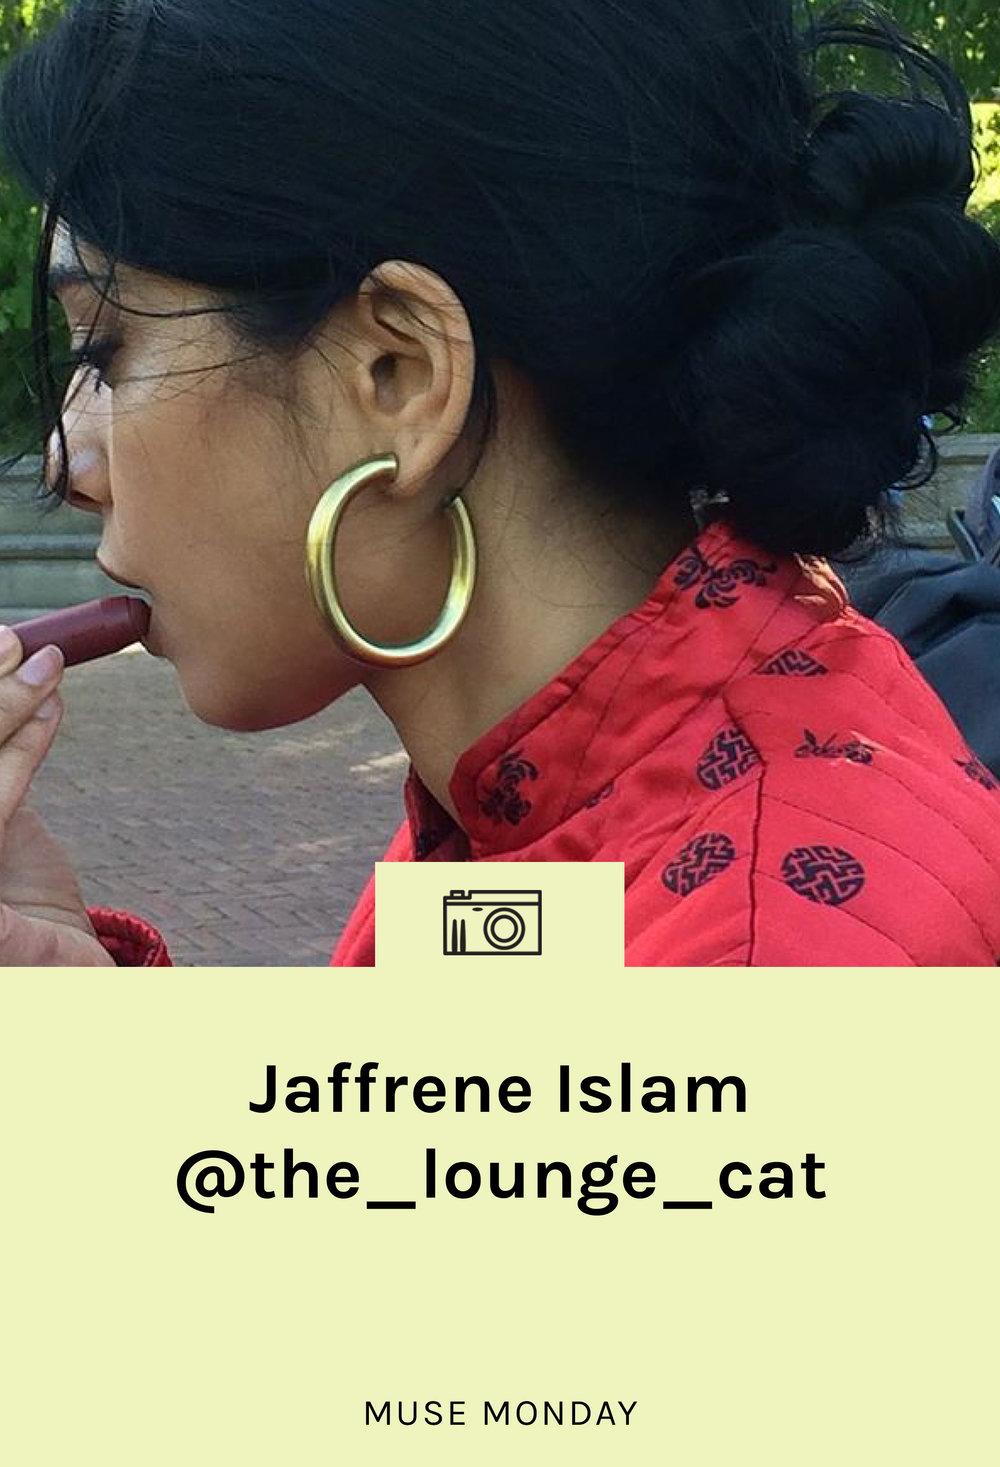 lisa-says-gah-muse-monday-jaffrene-islam